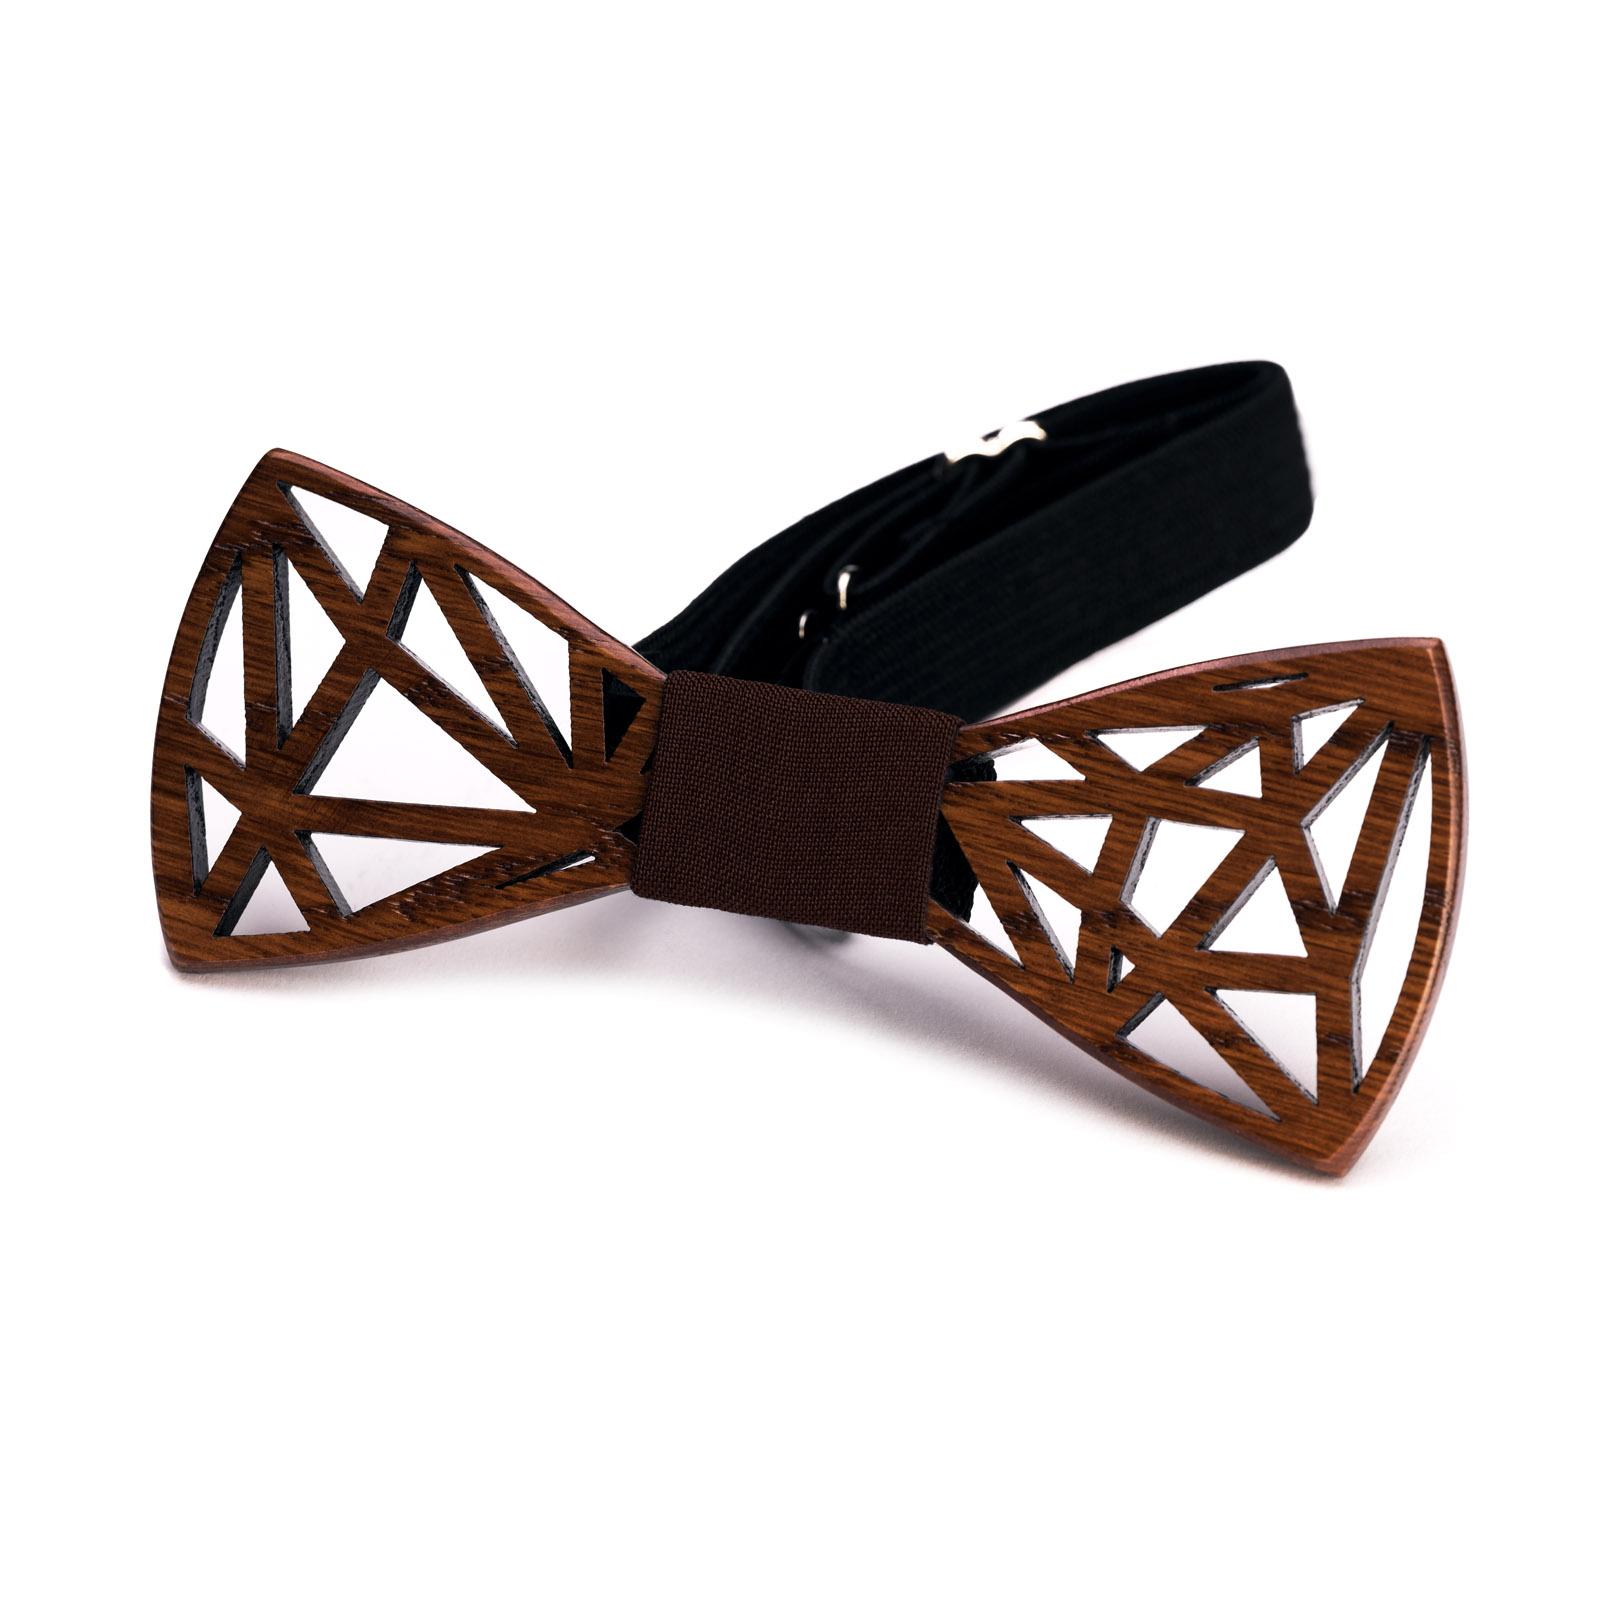 02-patore-reinhold-olymp-barna-facsokornyakkendo-elegancia-stilus-ferfias-oltozkodes-eskuvo-alkalmi-nyari-tavaszi-kek-barna-olymp-nyakkendo-kulonleges.jpg